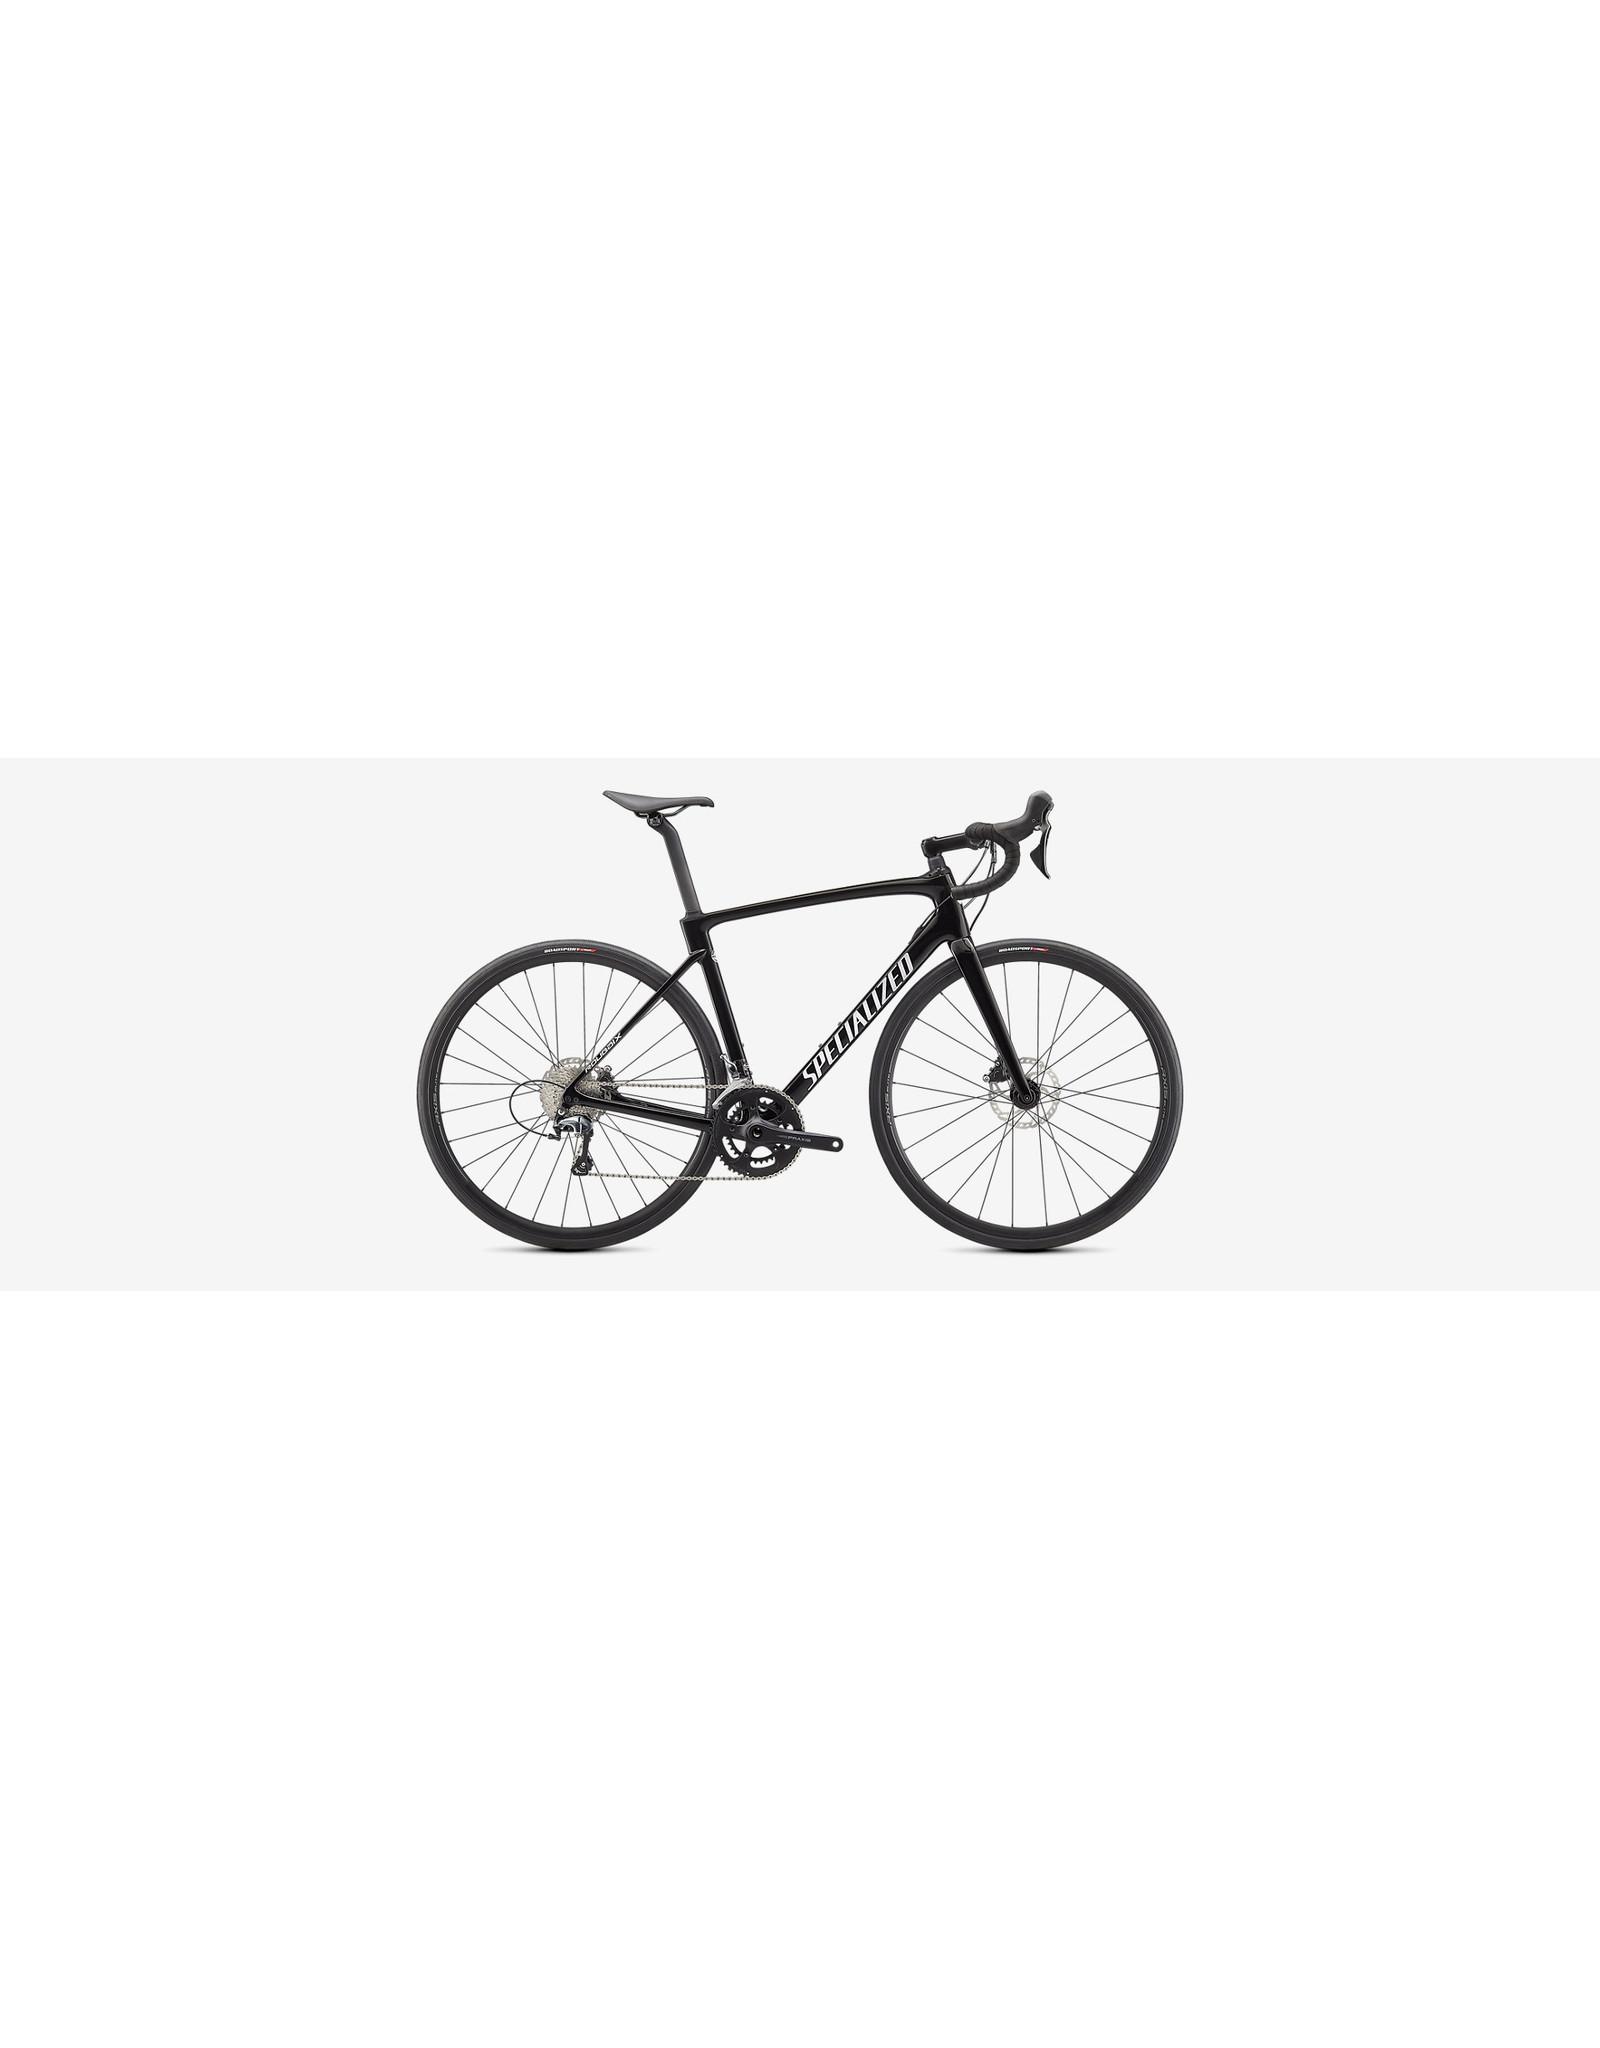 Specialized 21 Spec Roubaix Tarblk/Abln  56